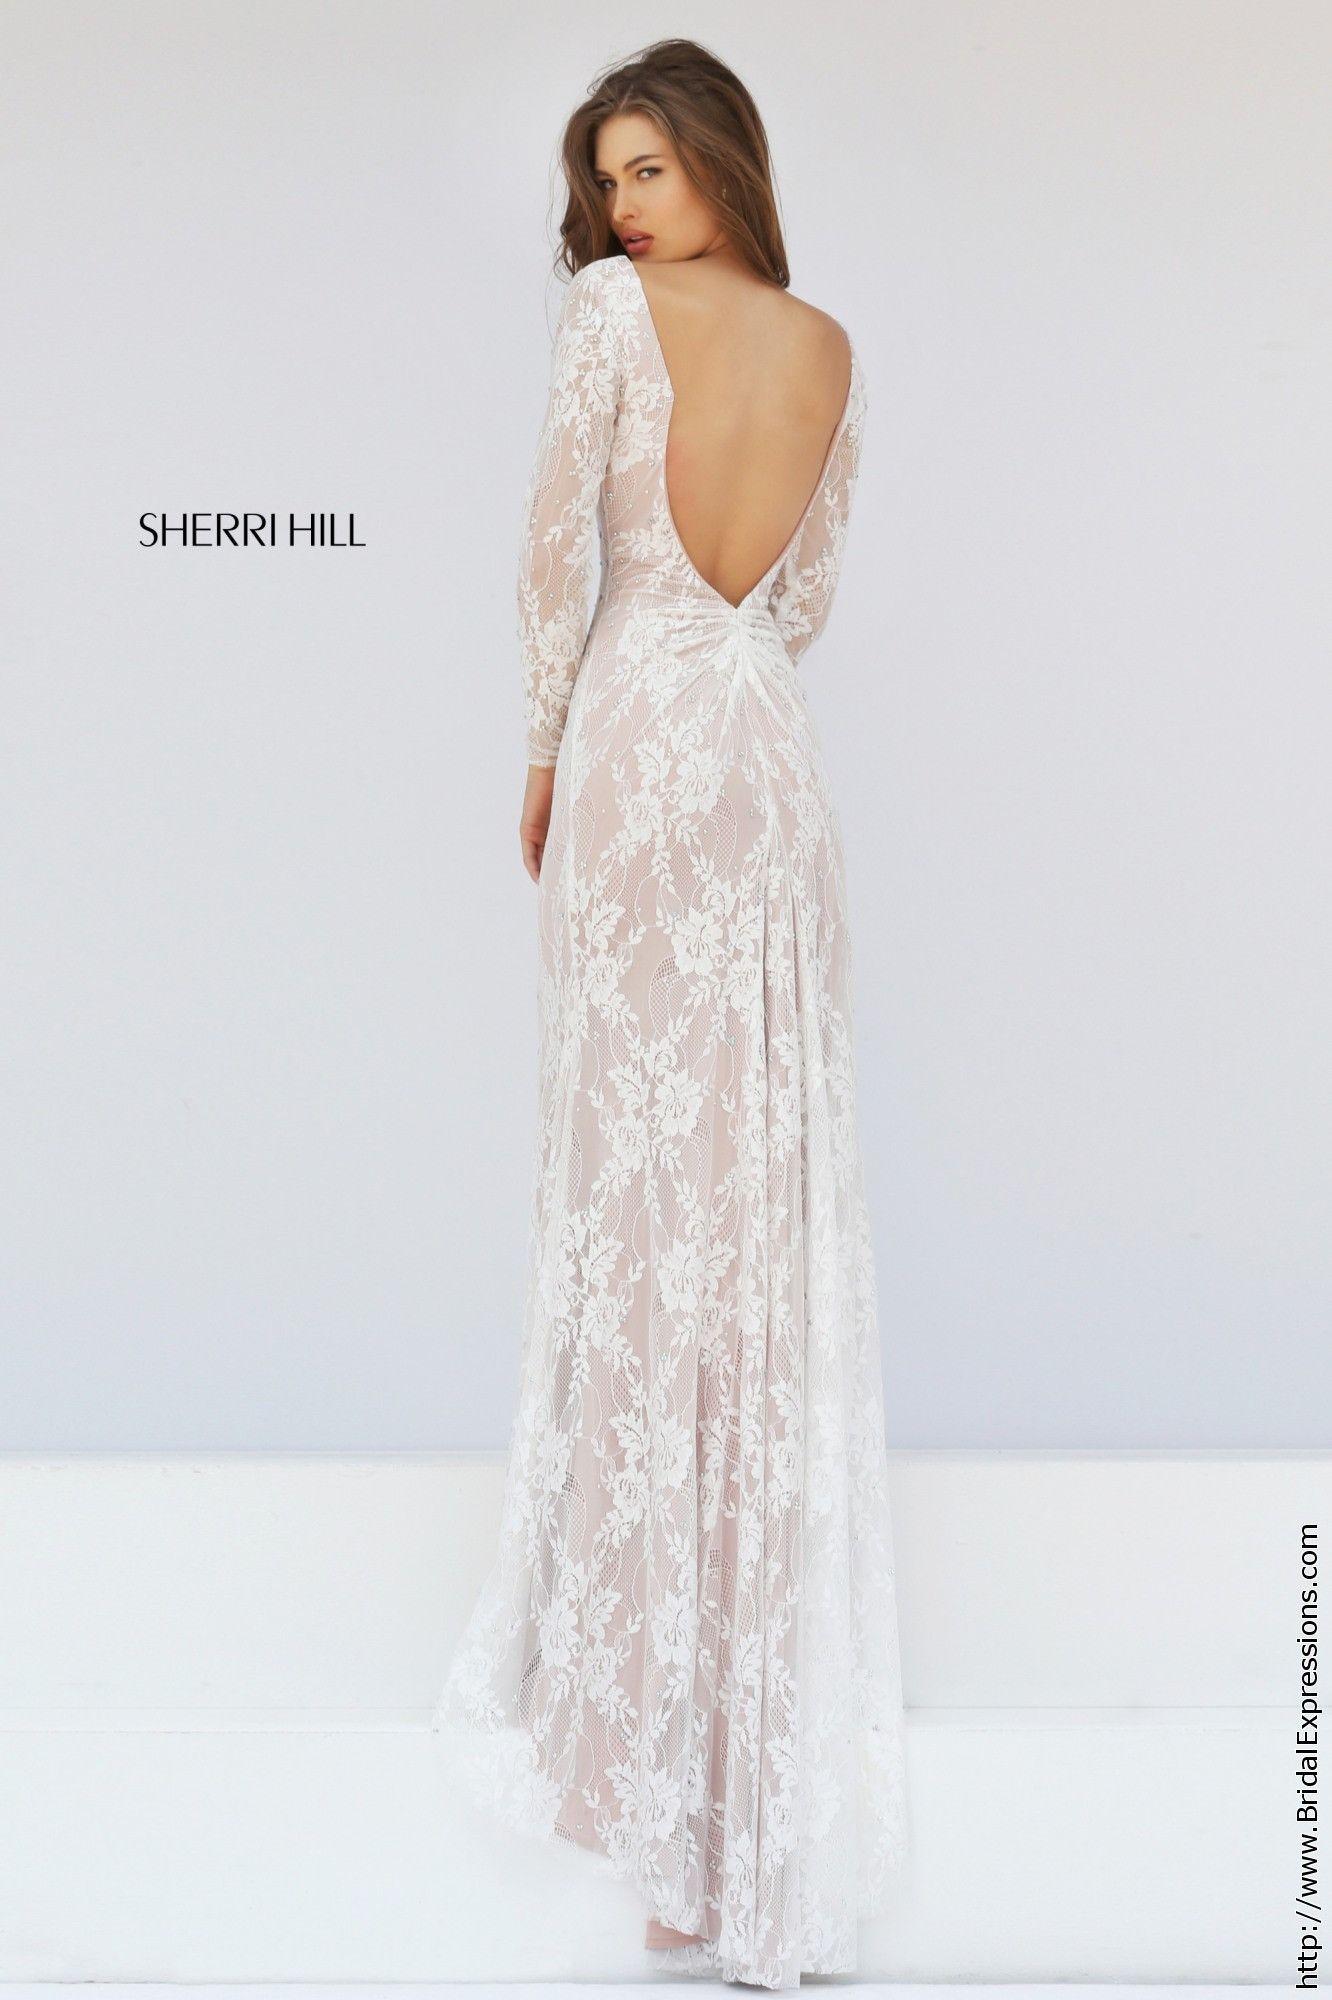 Sherri Hill 50019 Long Sleeve Stretch Lace Prom Dress | PROM ...